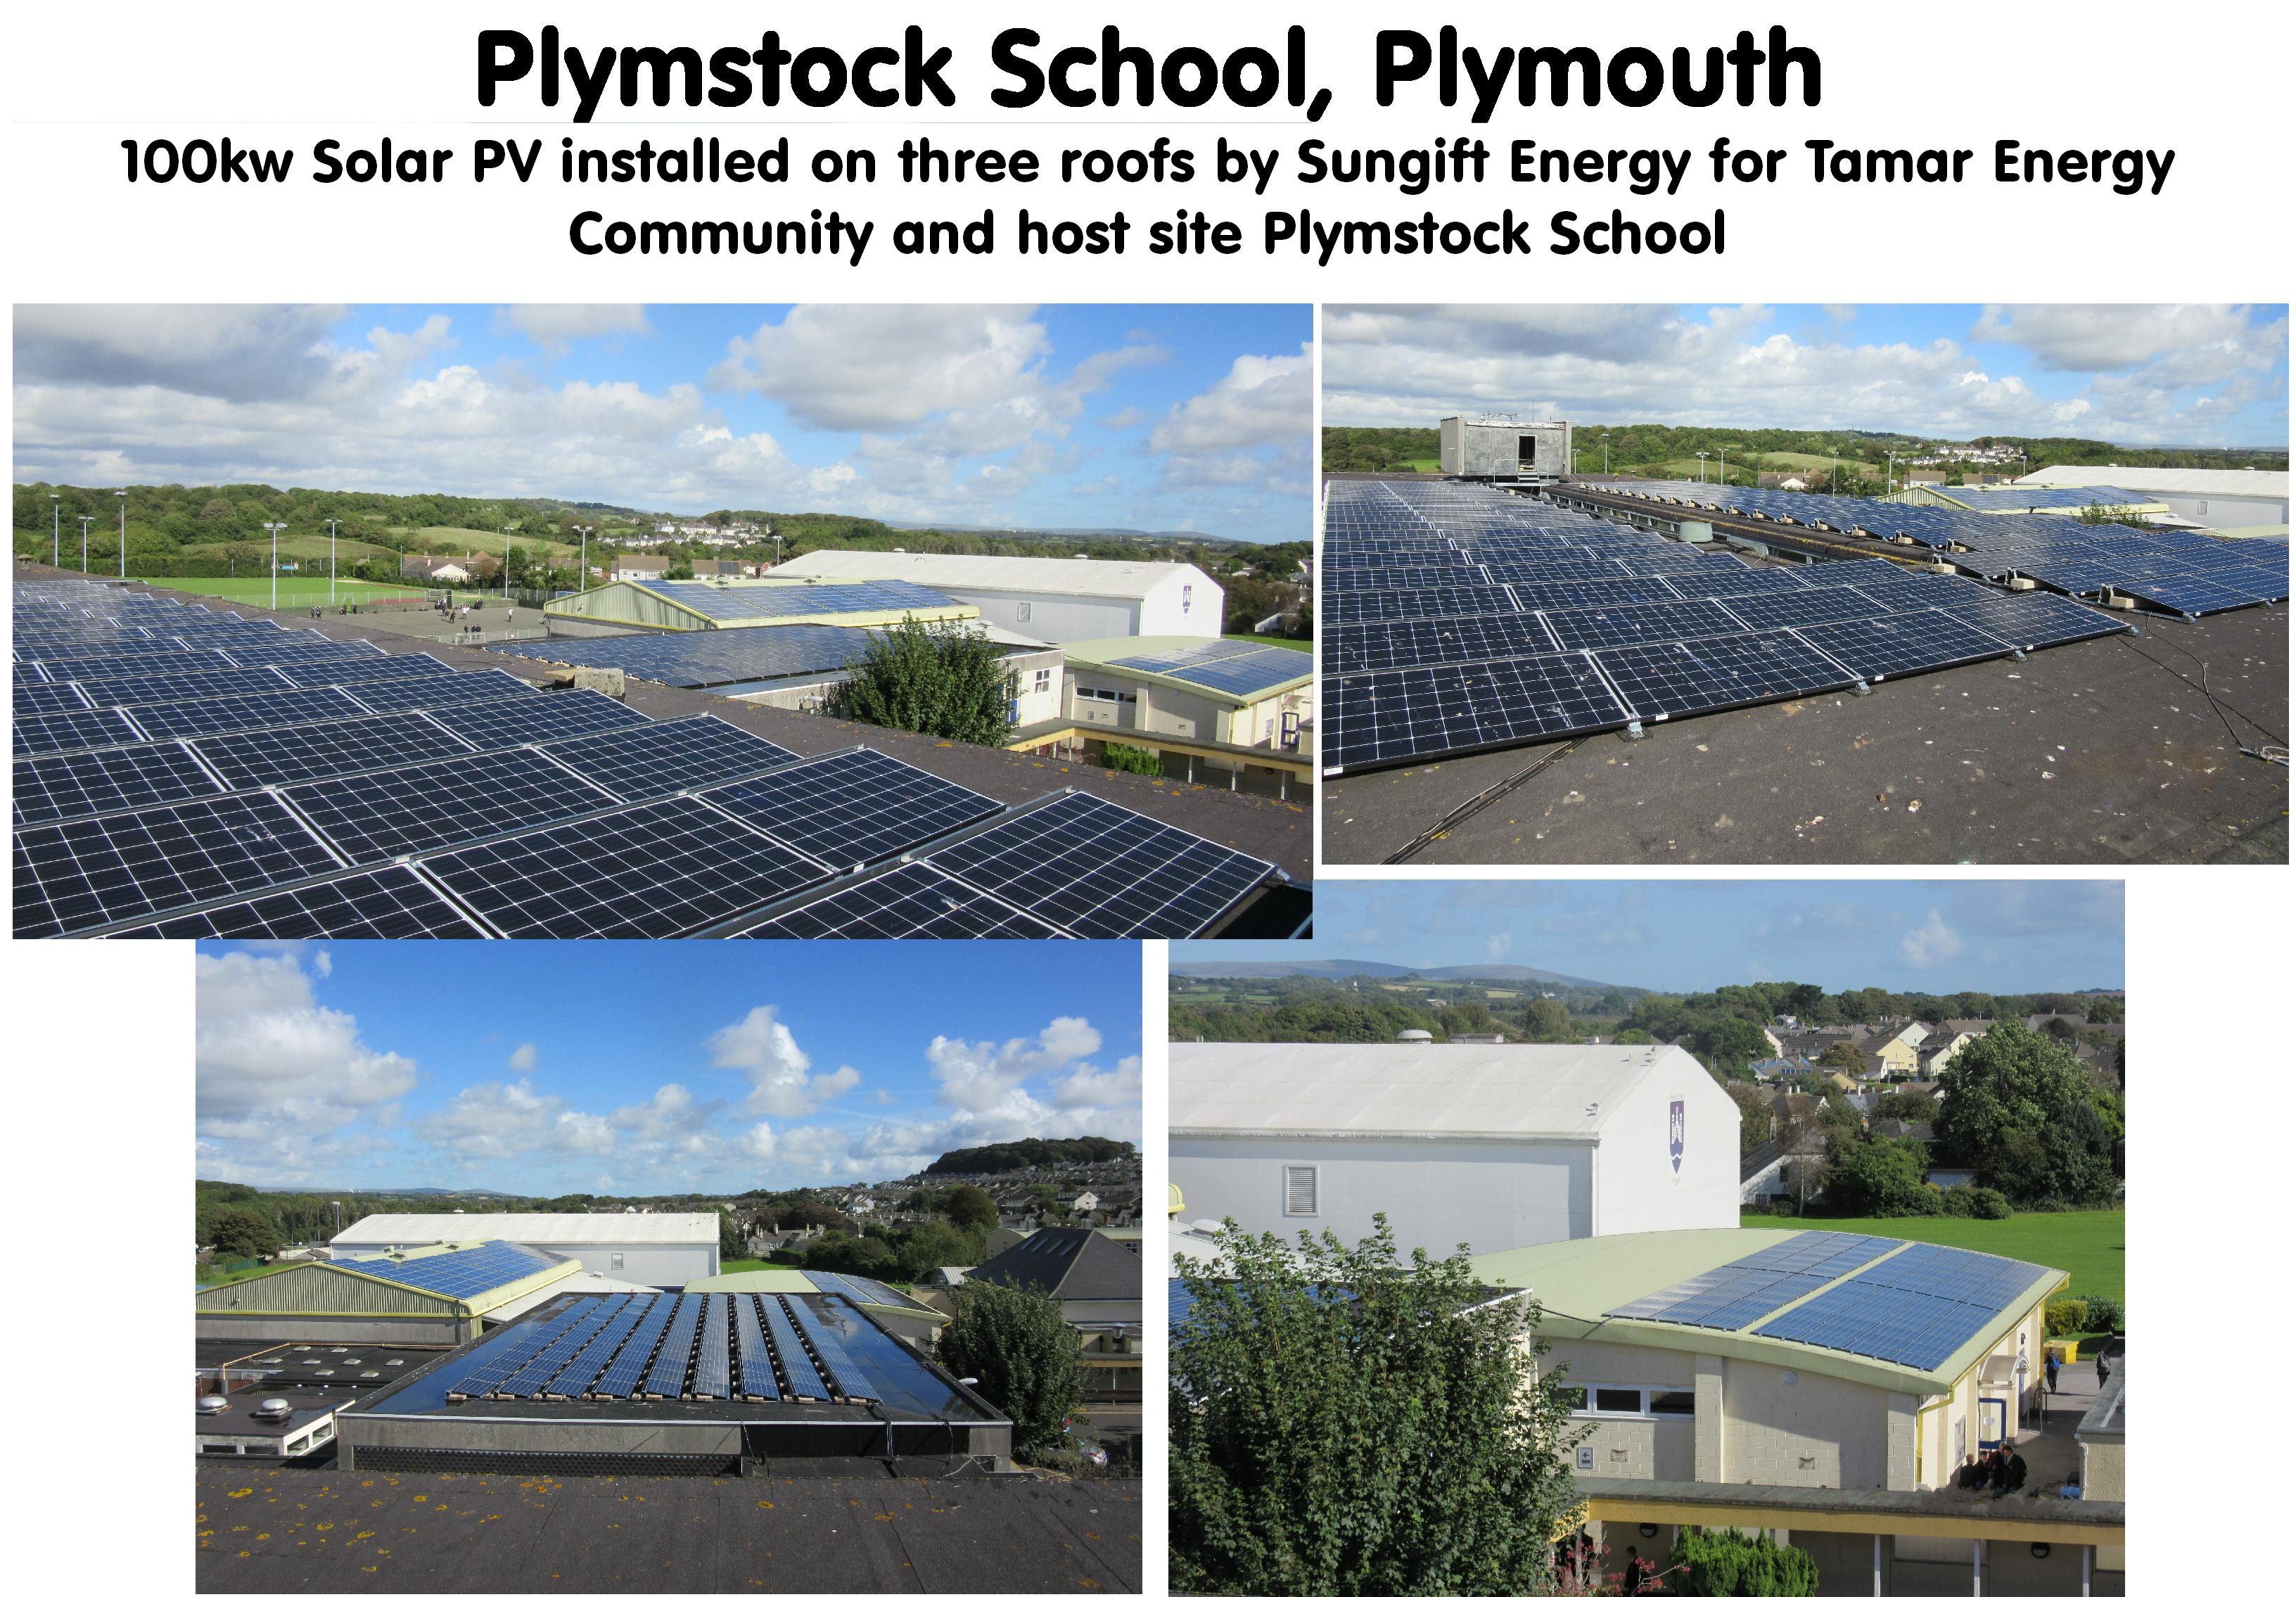 Plymstock School